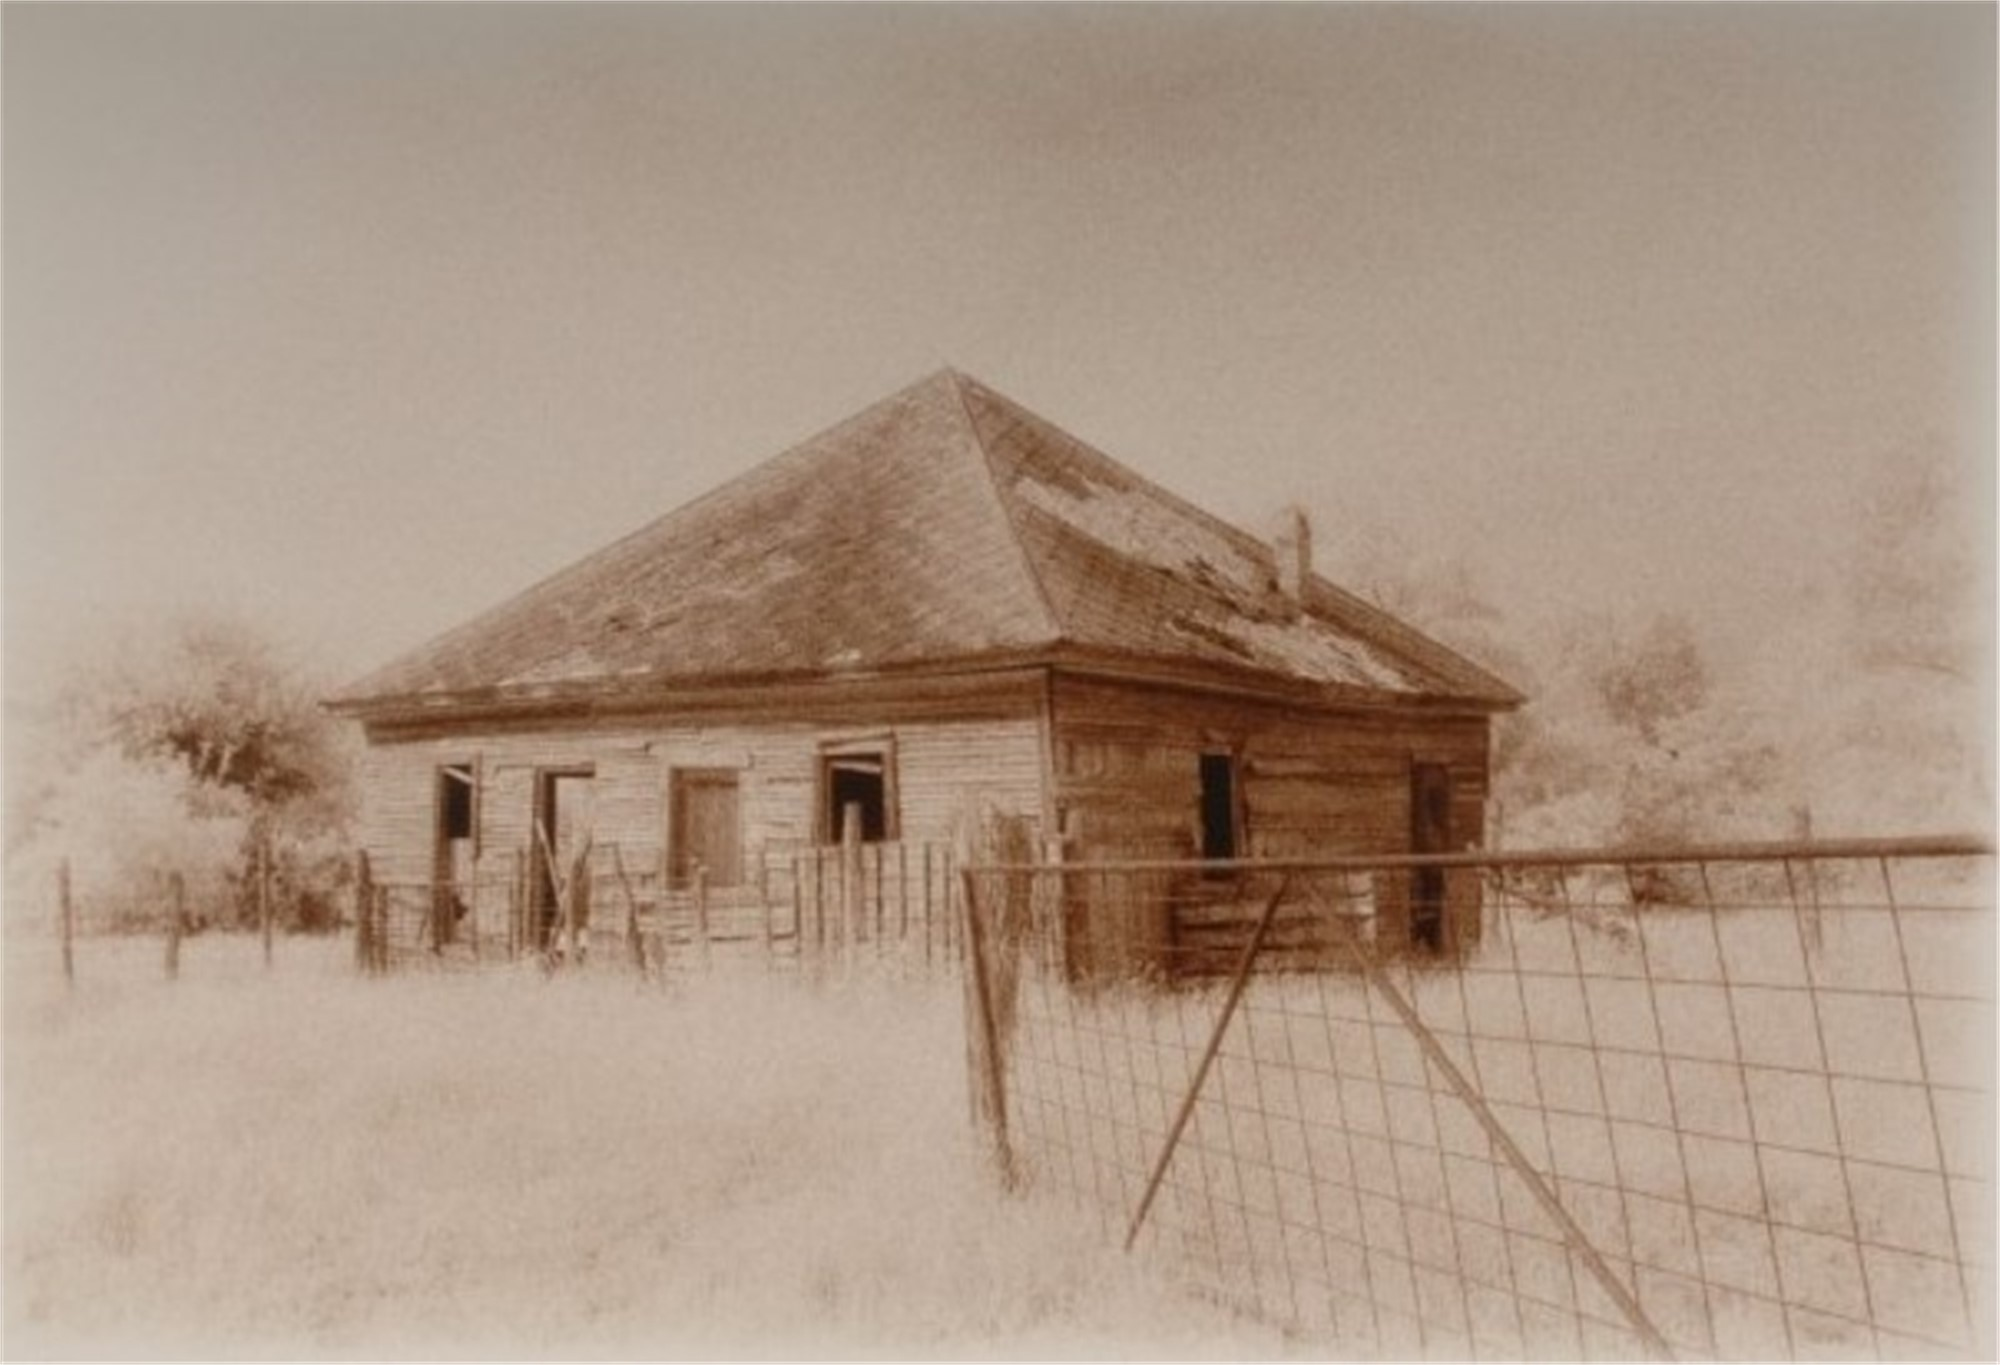 Dawson, Navarro County Texas by Tommy LaVergne